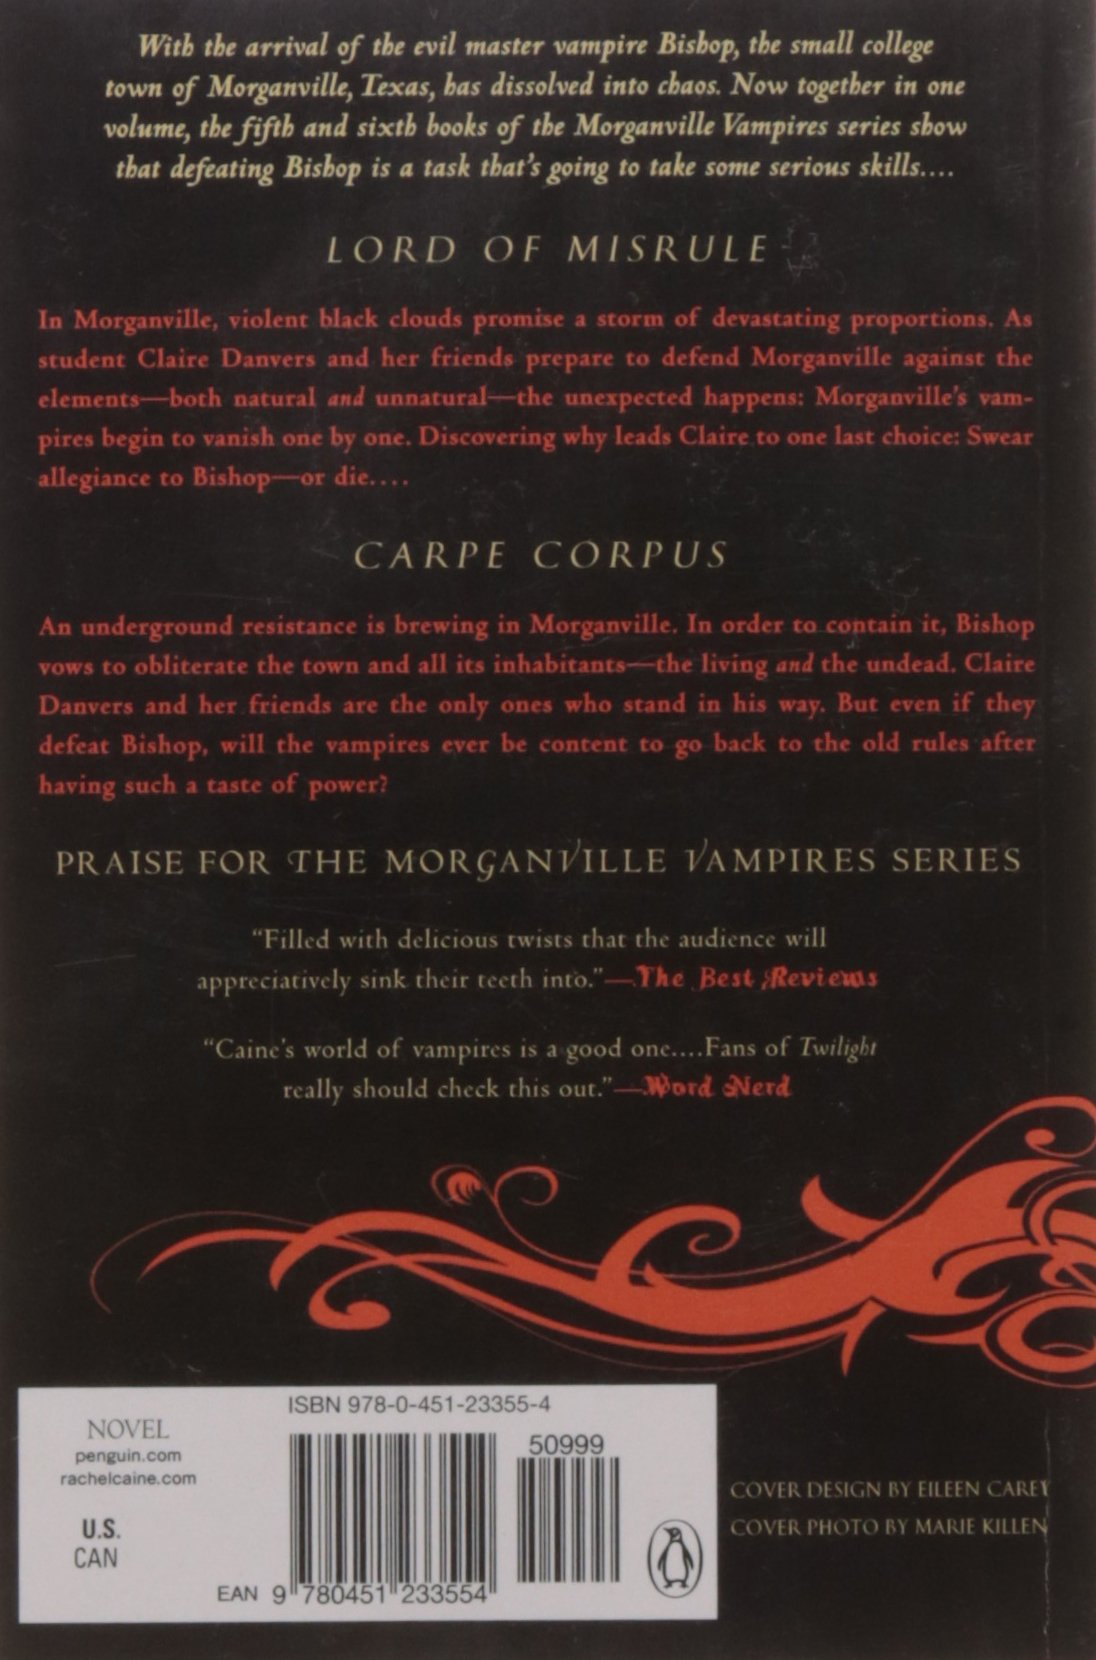 Amazon: The Morganville Vampires, Vol 3 (9780451233554): Rachel Caine:  Books